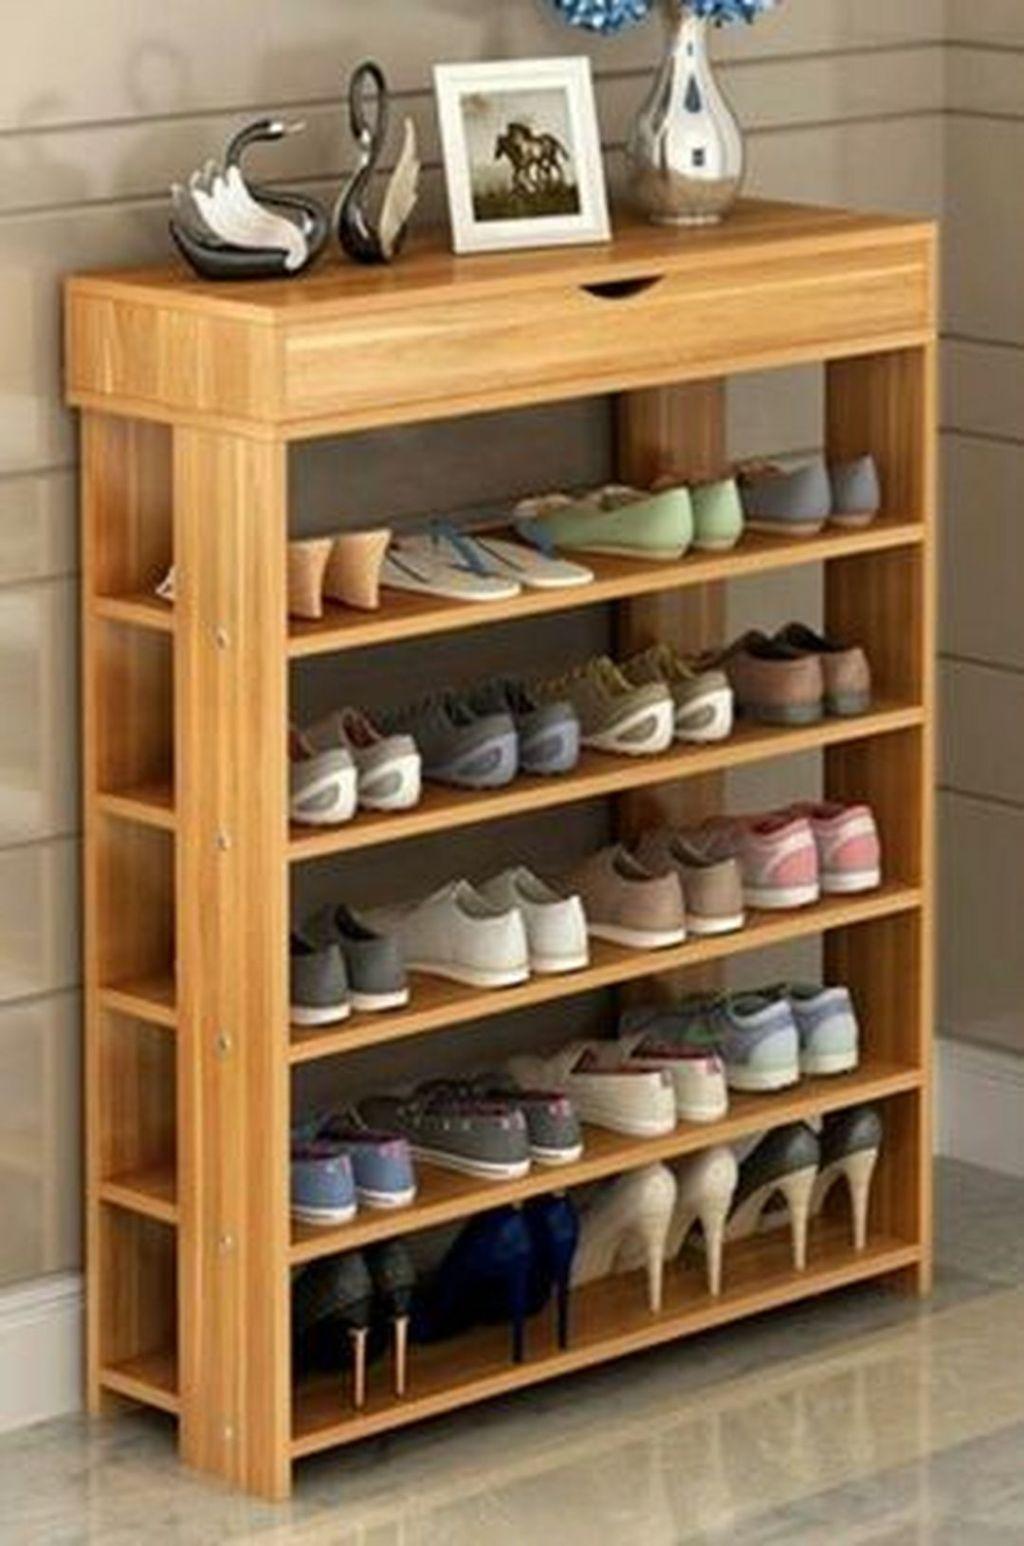 17 Brilliant Shoes Storage Ideas On A Budget Wooden Shoe Racks Wooden Shoe Rack Designs Diy Bedroom Storage